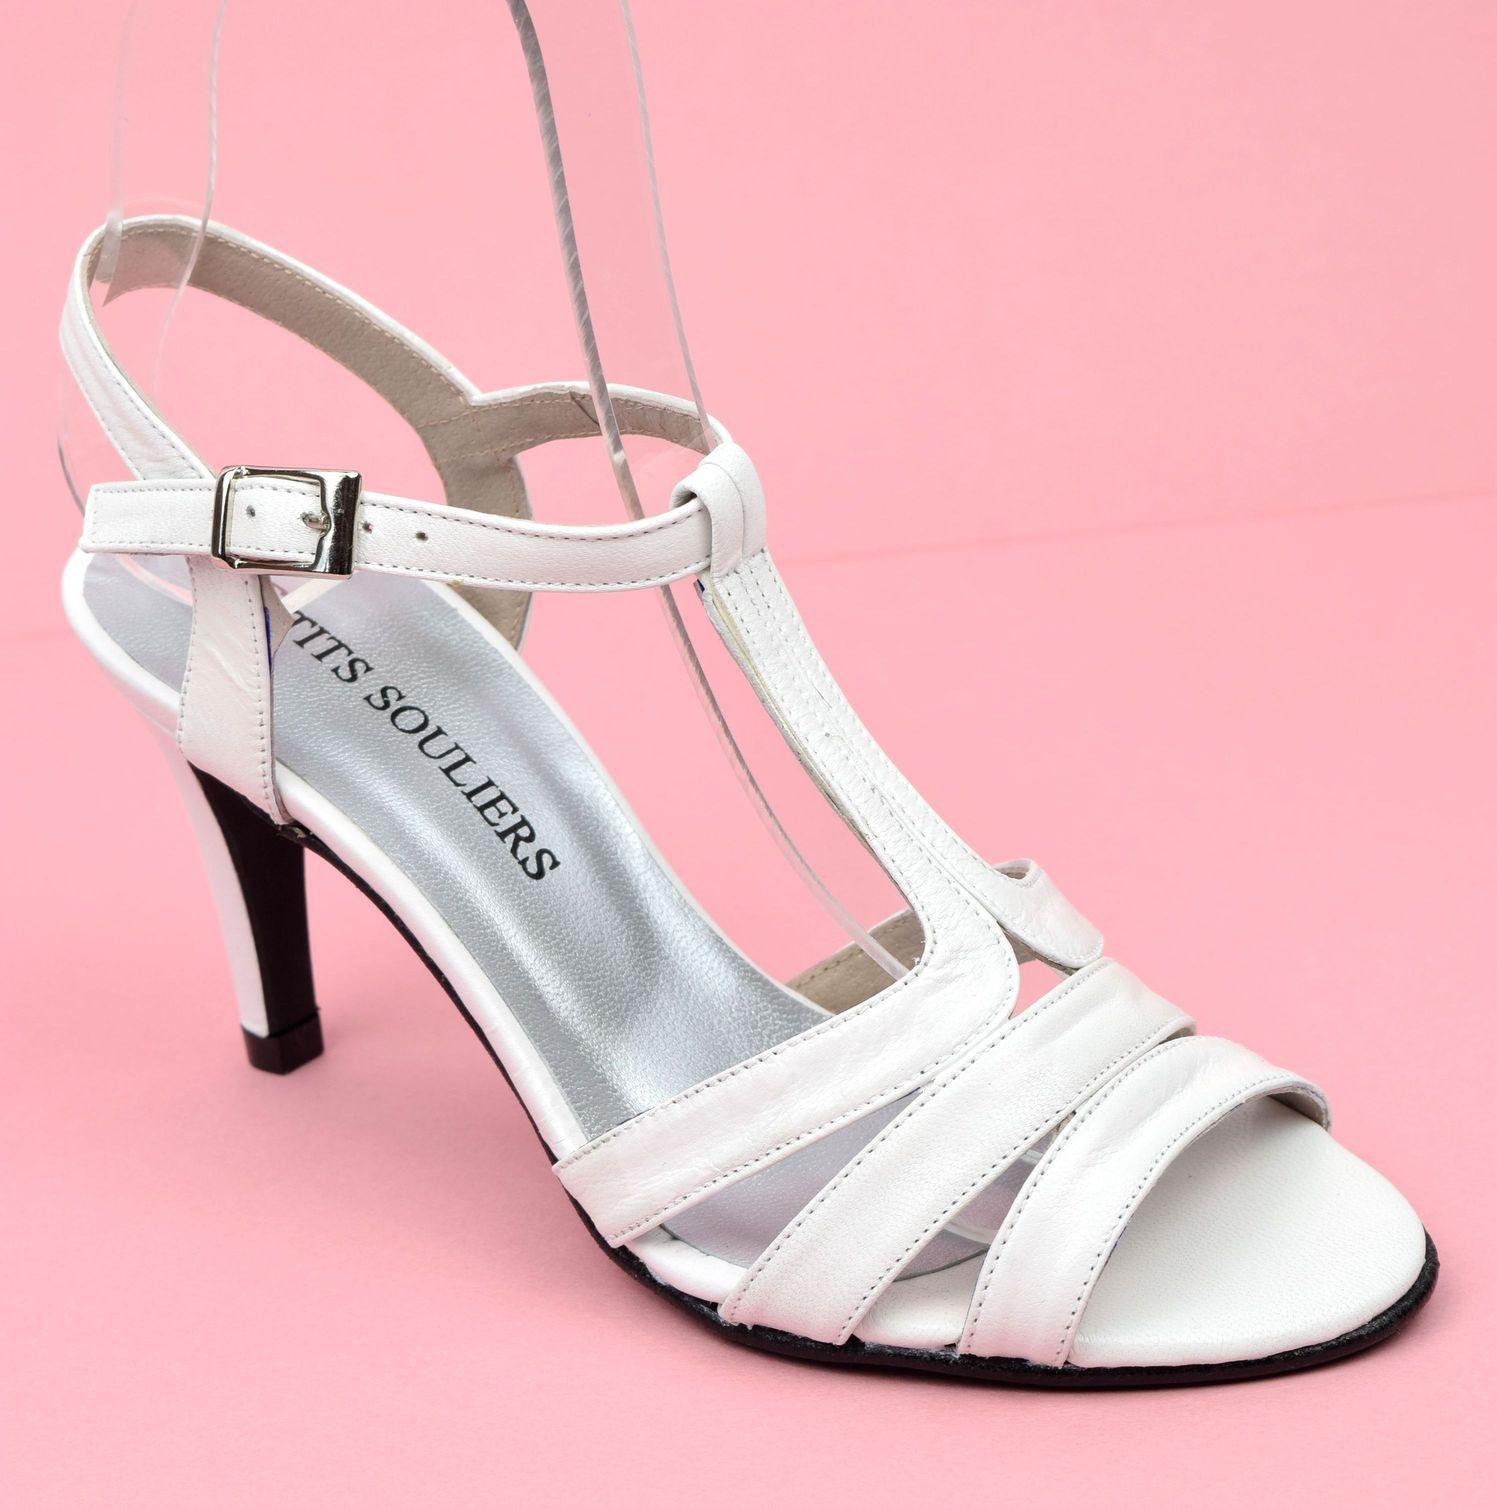 chaussures de sport 3626c e05a1 Sandales cuir mate, Brenda Zaro, blanches, talons 8 cm ...